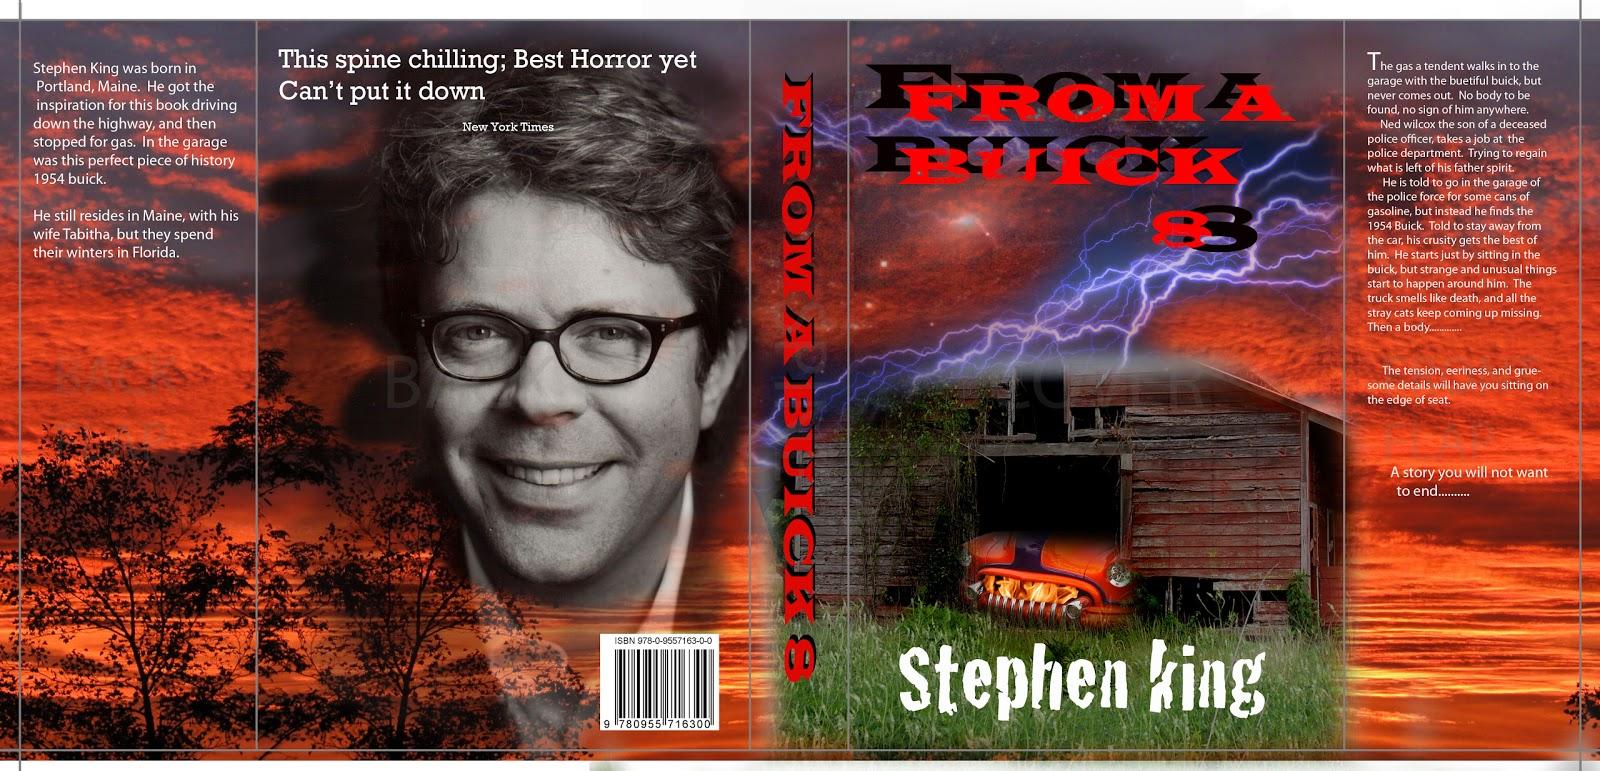 Stephen King Book Cover Art : Jennie art work stephen king book cover